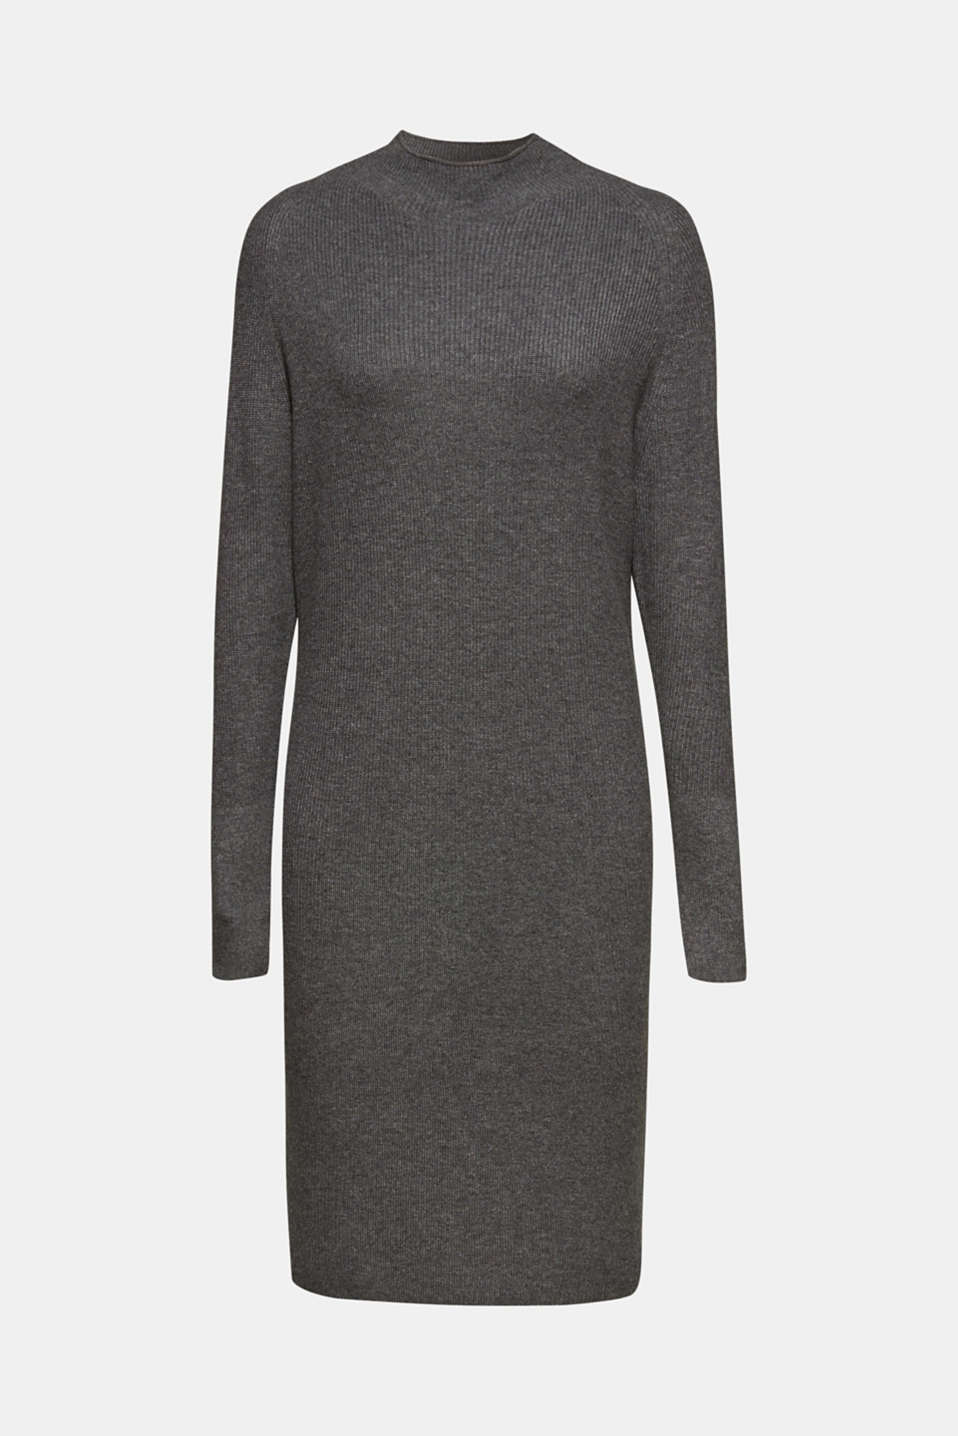 Dresses flat knitted, GUNMETAL 5, detail image number 6